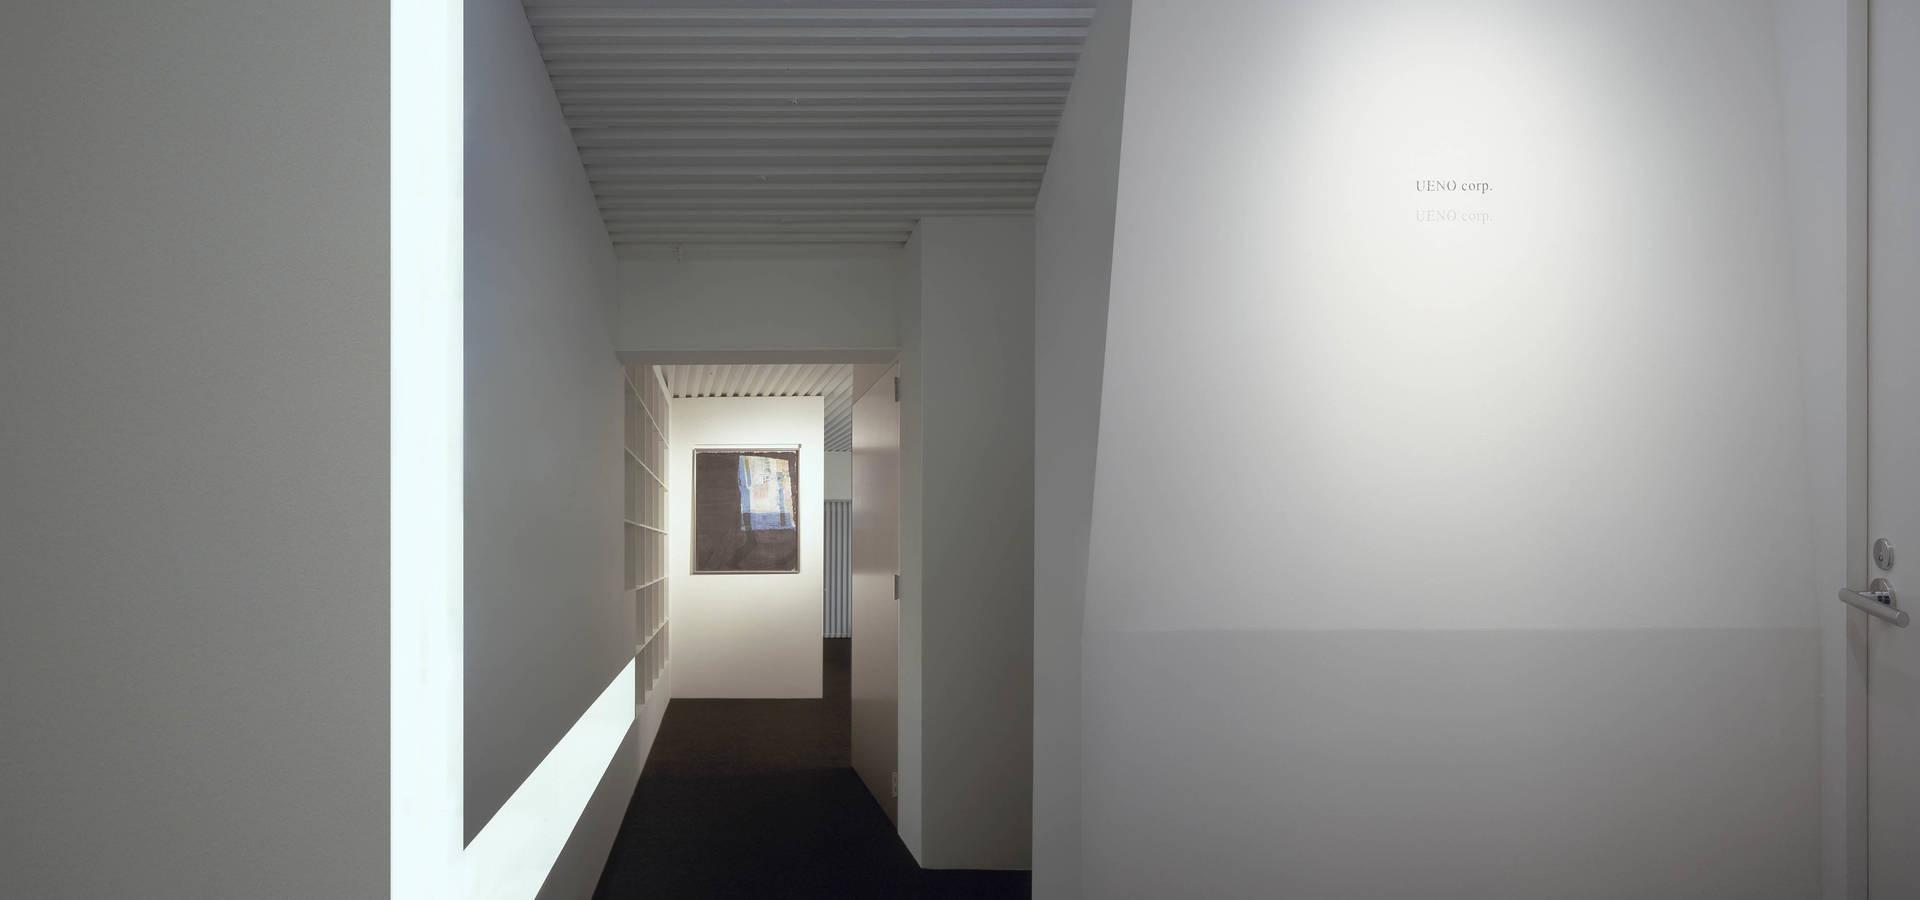 Madhut Architects